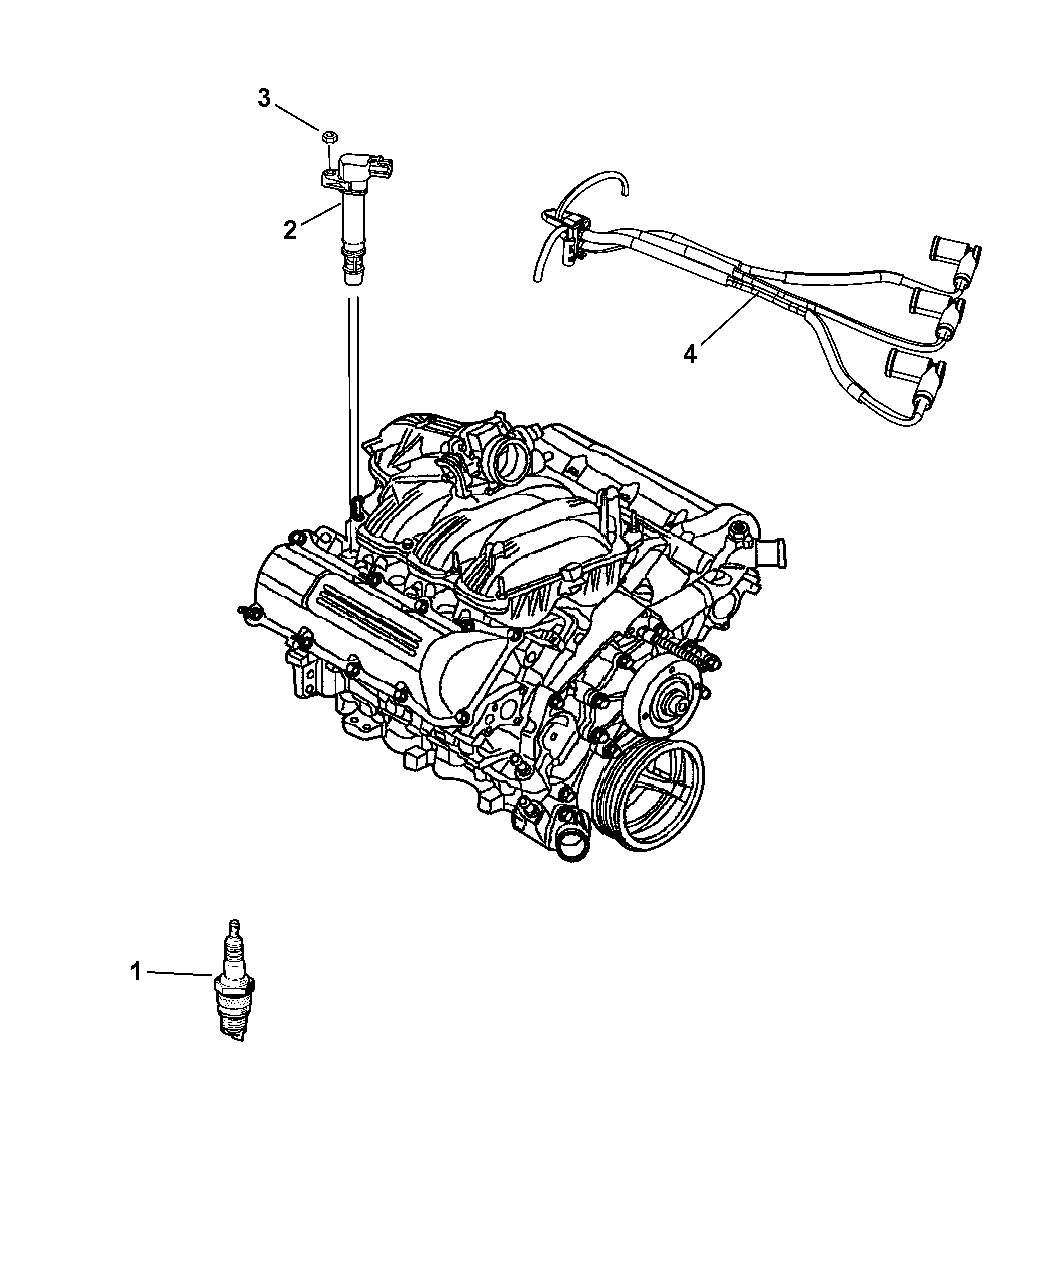 2011 Dodge Nitro Ignition Spark Plugs, Cables & Coils